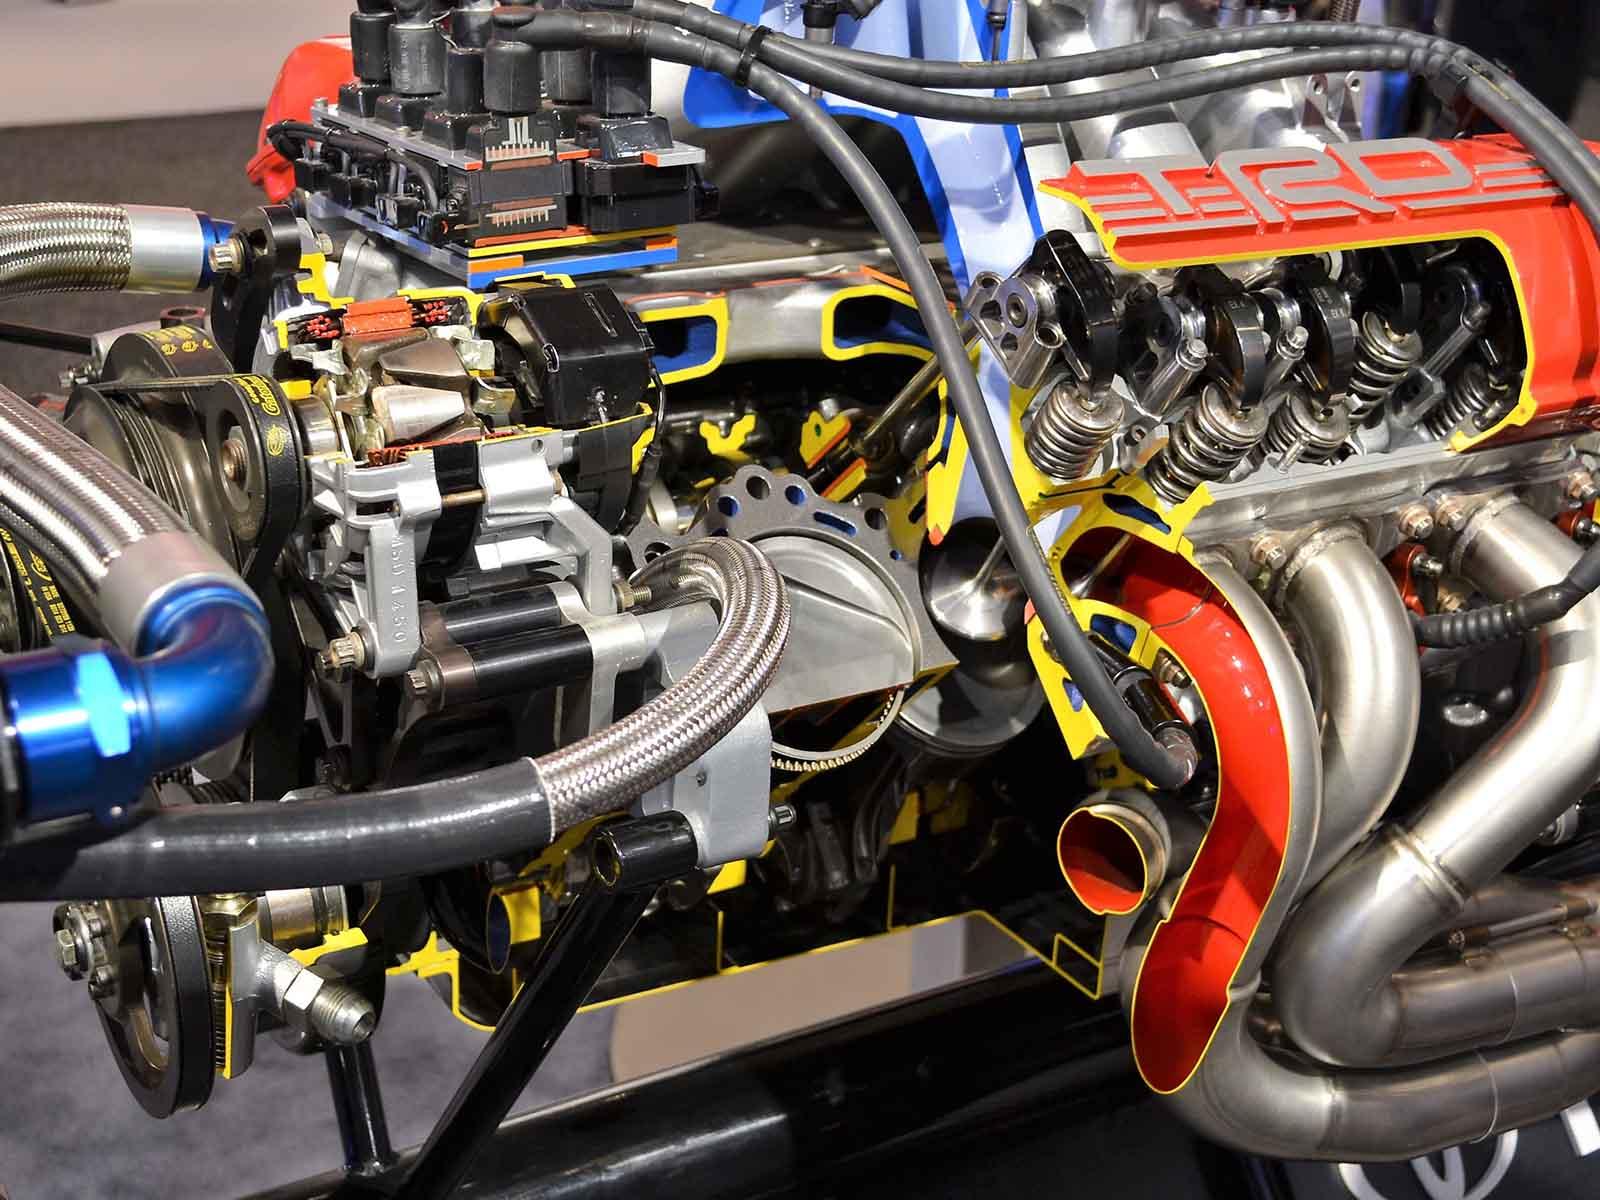 ServyCar-Taller-mecanico-automovil-multimarca-zaragoza-centro-Blog-imagen-principal-Servycar-EstamosEnElCentro-201808xx-08_1600x1200